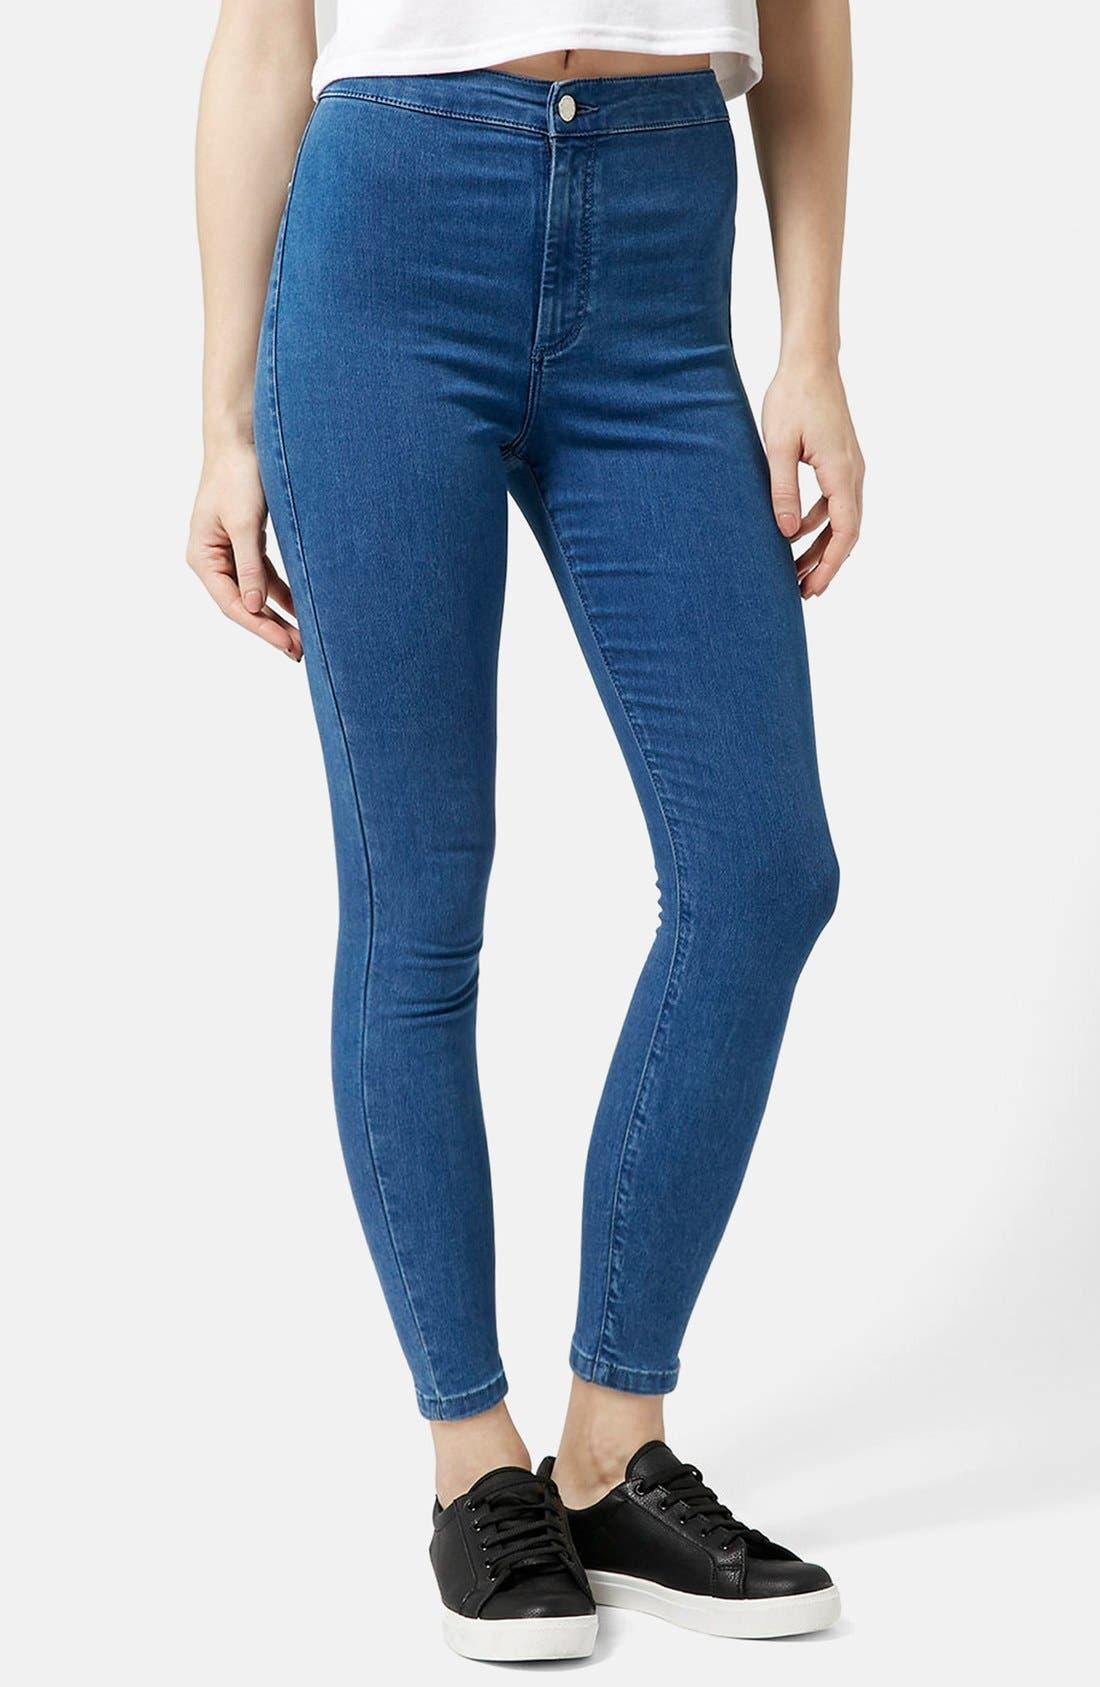 Alternate Image 1 Selected - Topshop Moto 'Joni' High Rise Super Skinny Jeans (Mid Denim) (Petite)